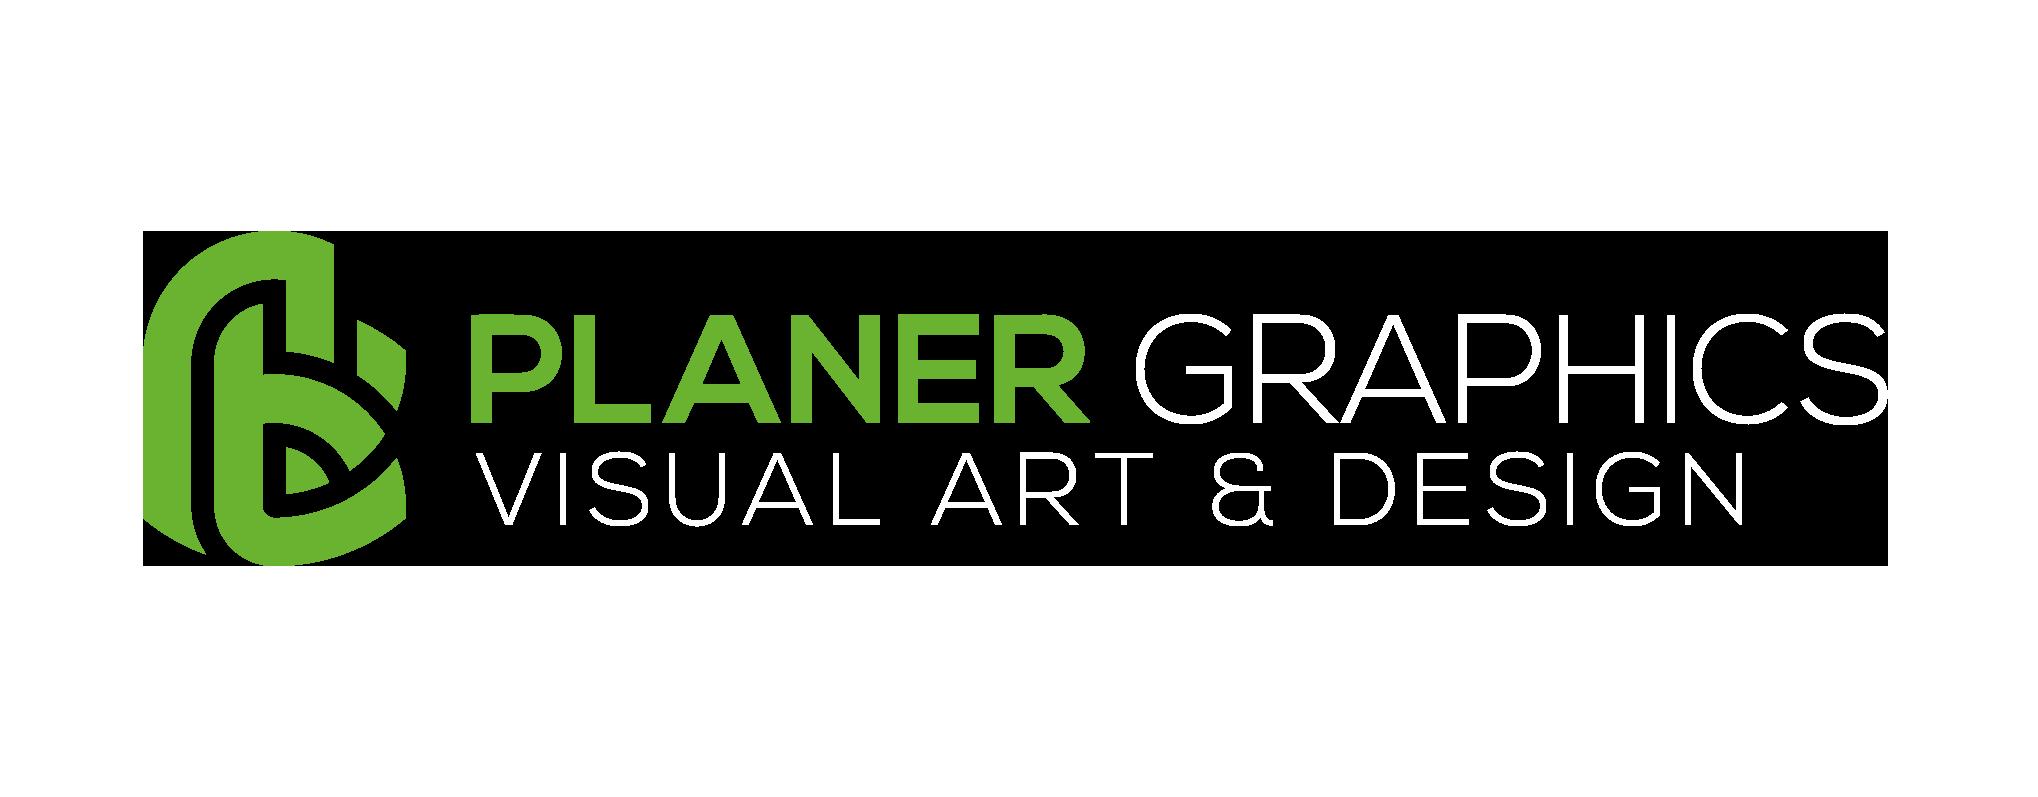 Planer Graphics   Visual Art & Design